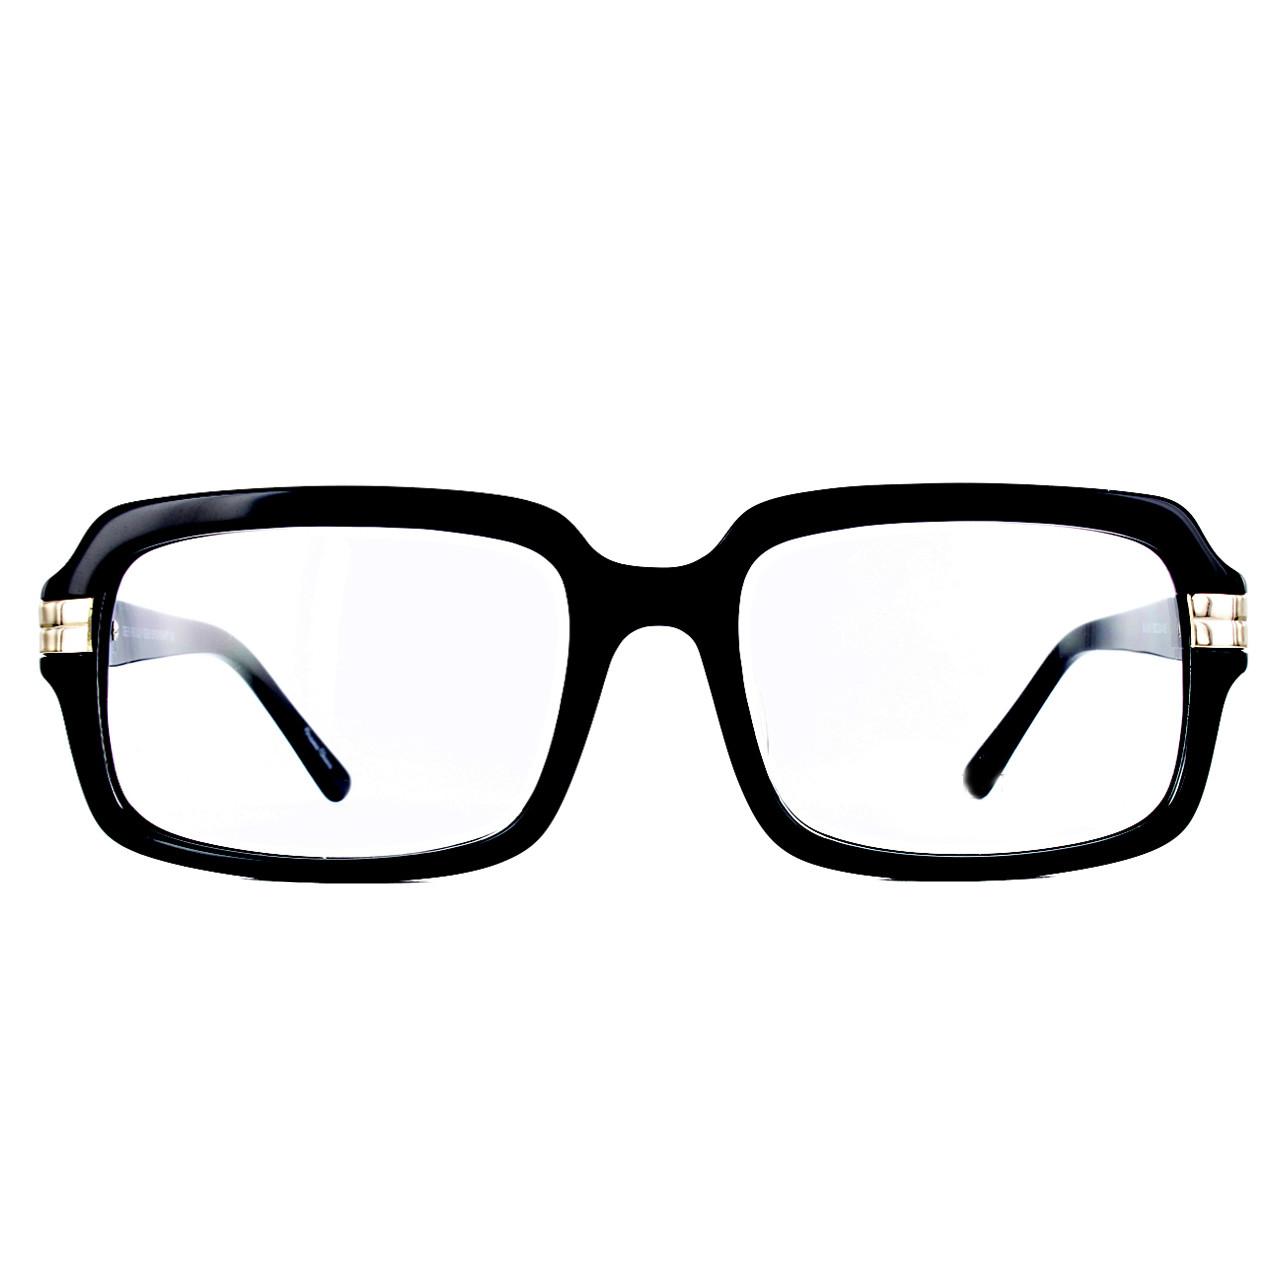 GEEK Eyewear GEEK ROUQ 8 Black Frame